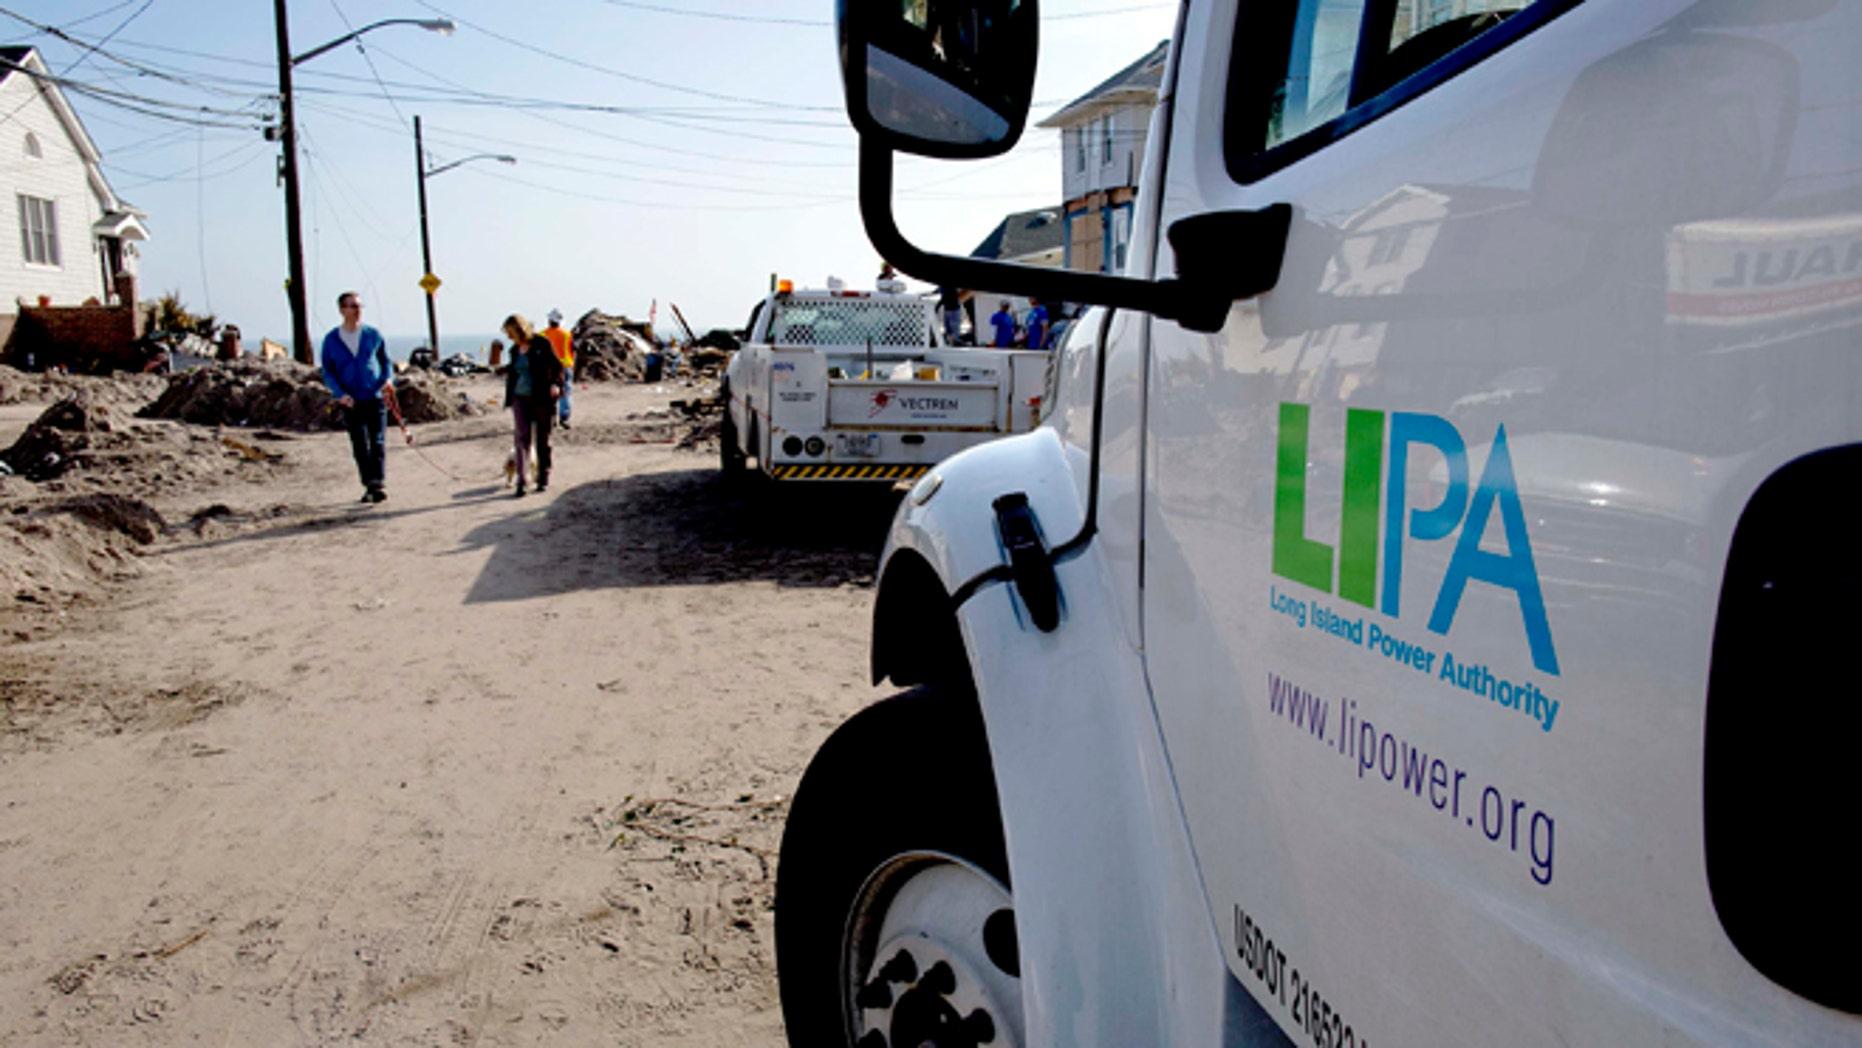 Nov. 12: A Long Island Power Authority (LIPA) truck is seen in the Belle Harbor neighborhood in Queens, New York.